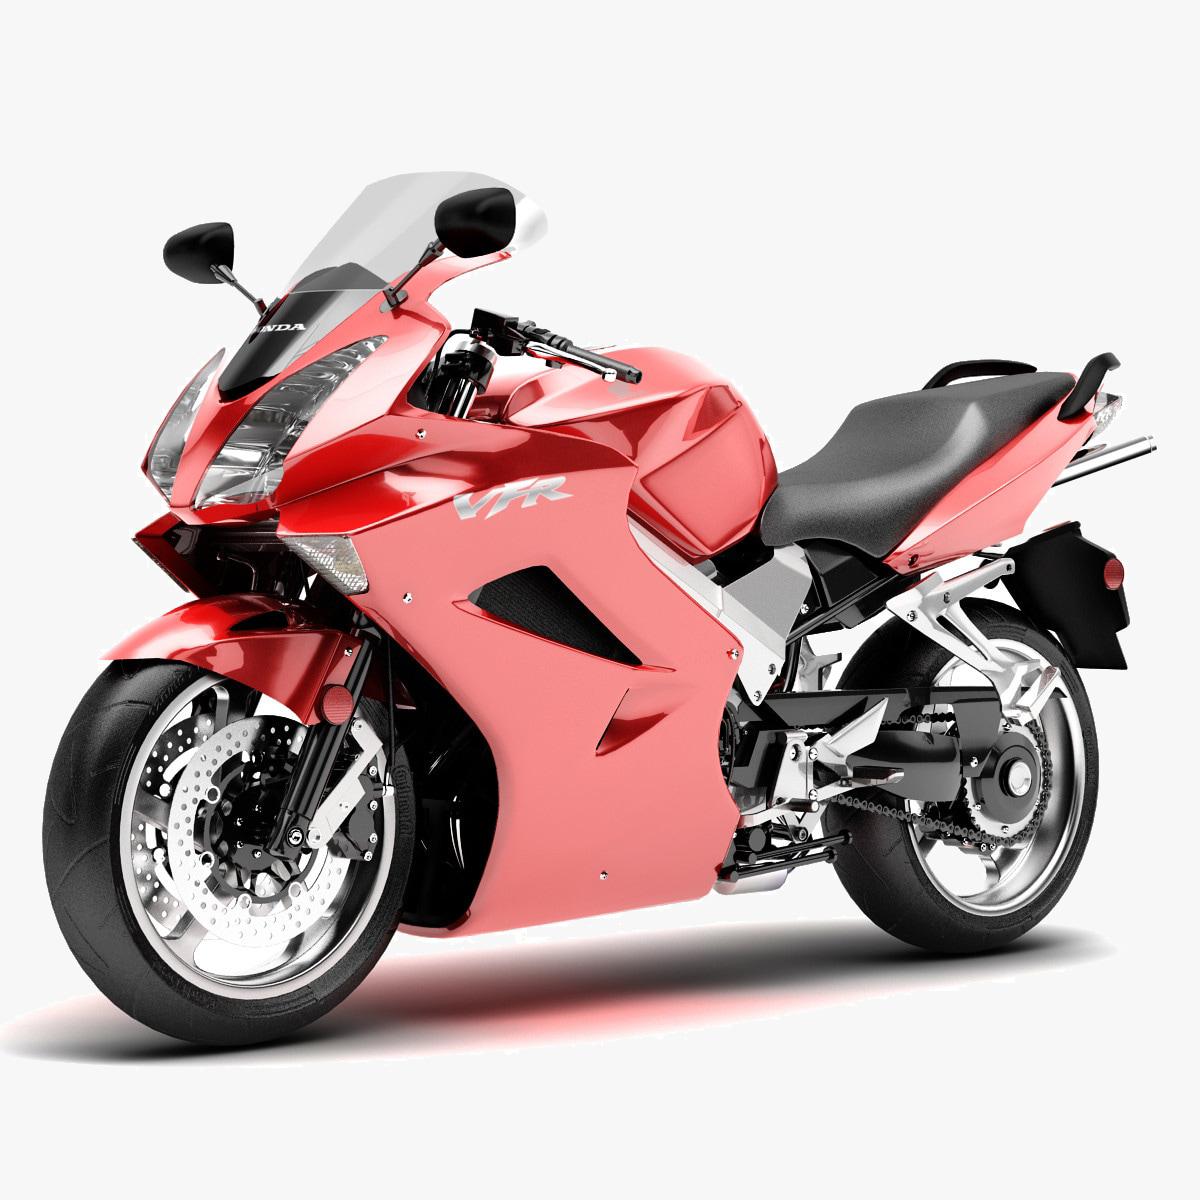 Obj Motorcycle Honda Vfr 800